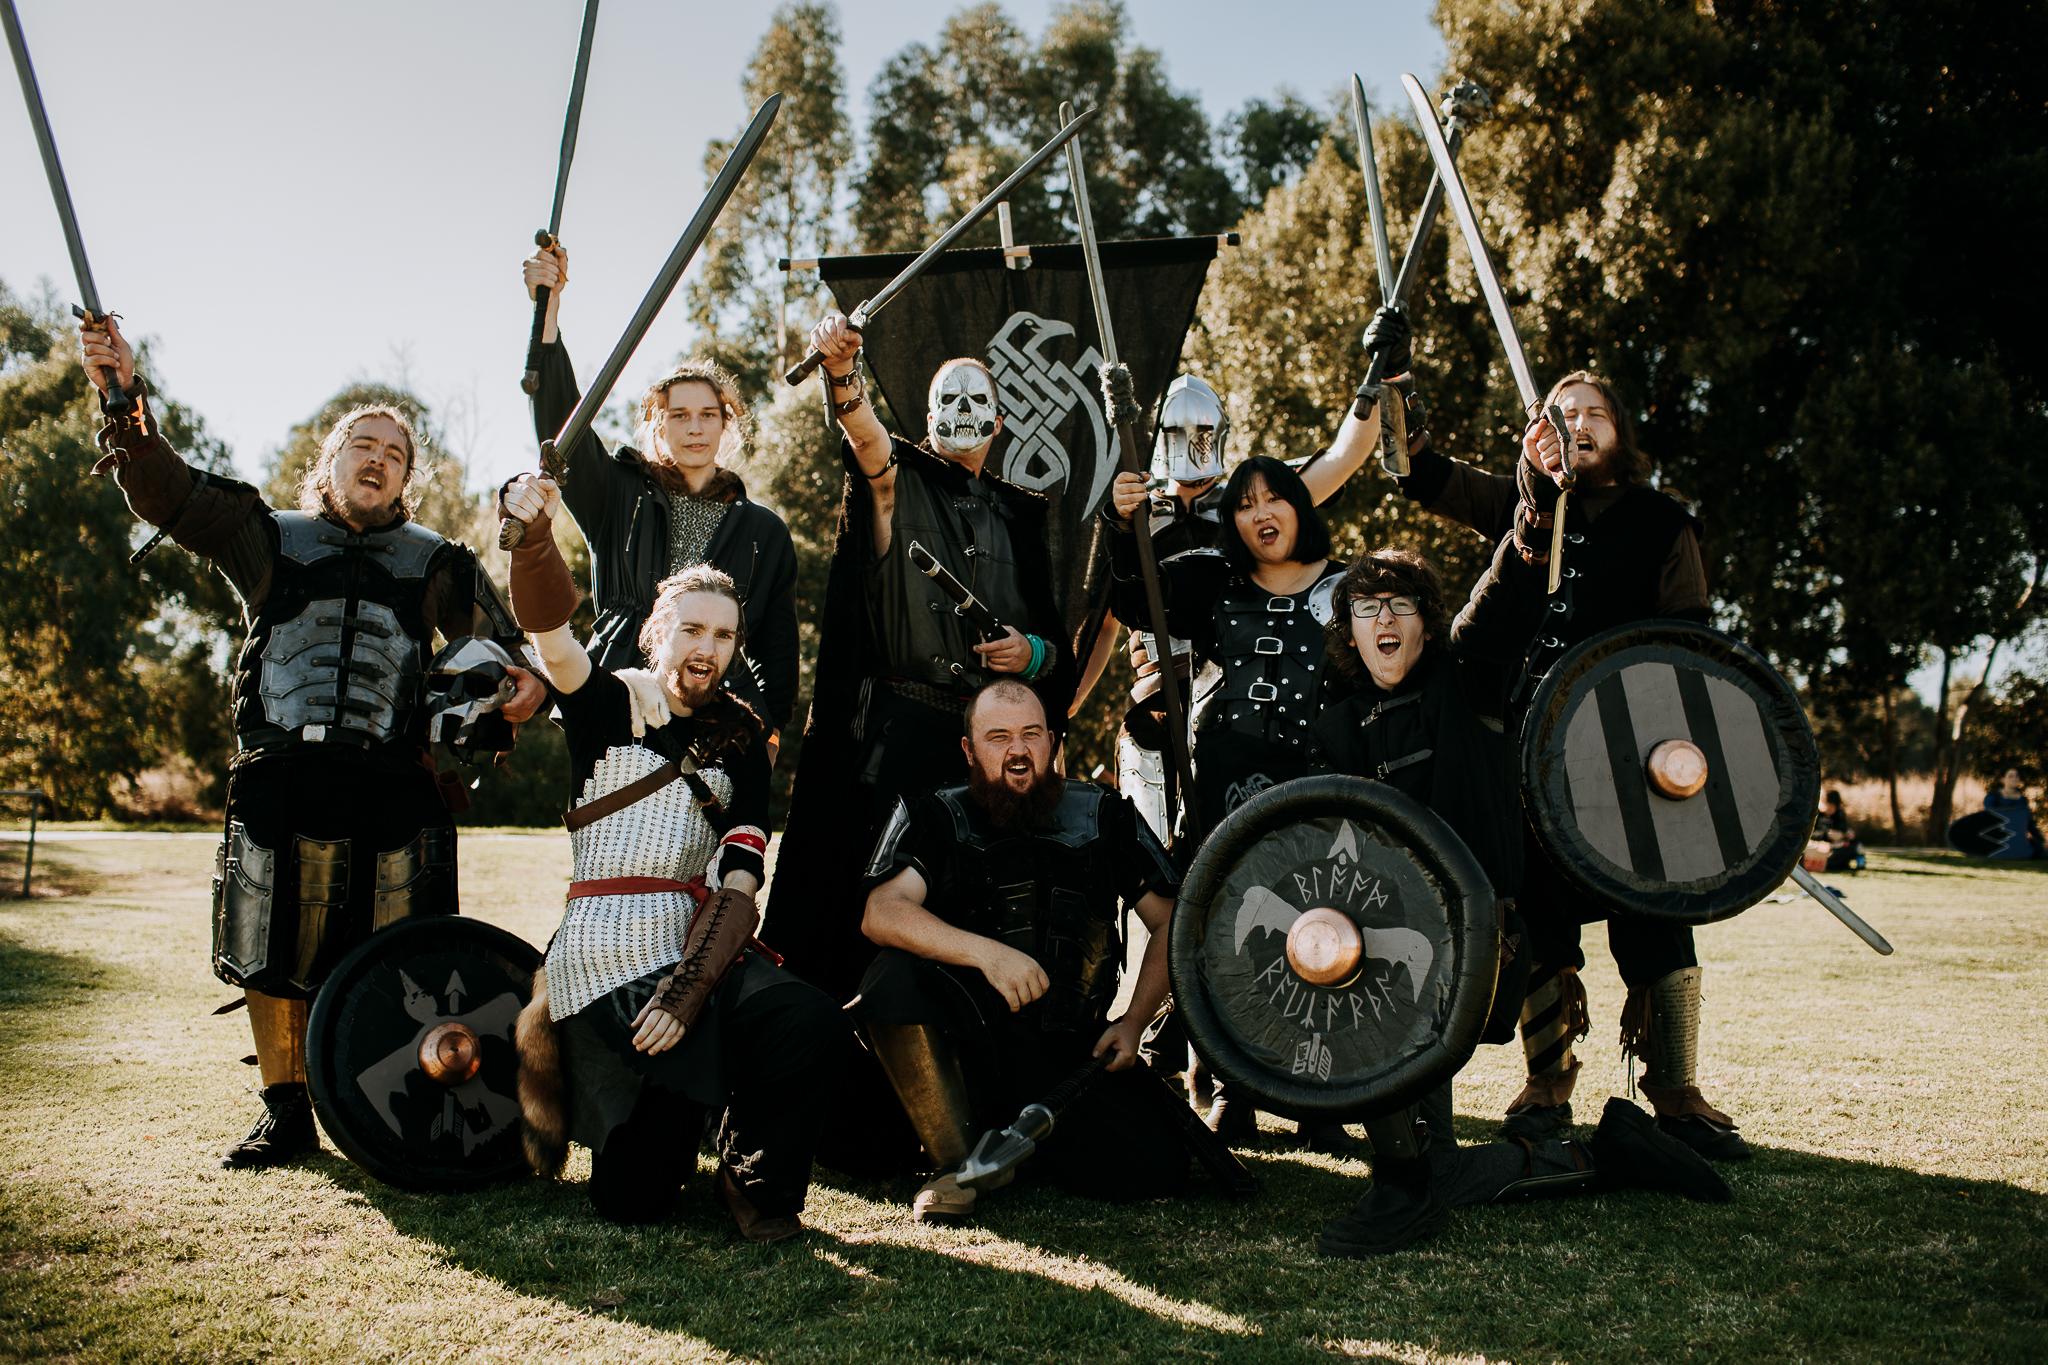 Swordcraft-1530_LR.jpg